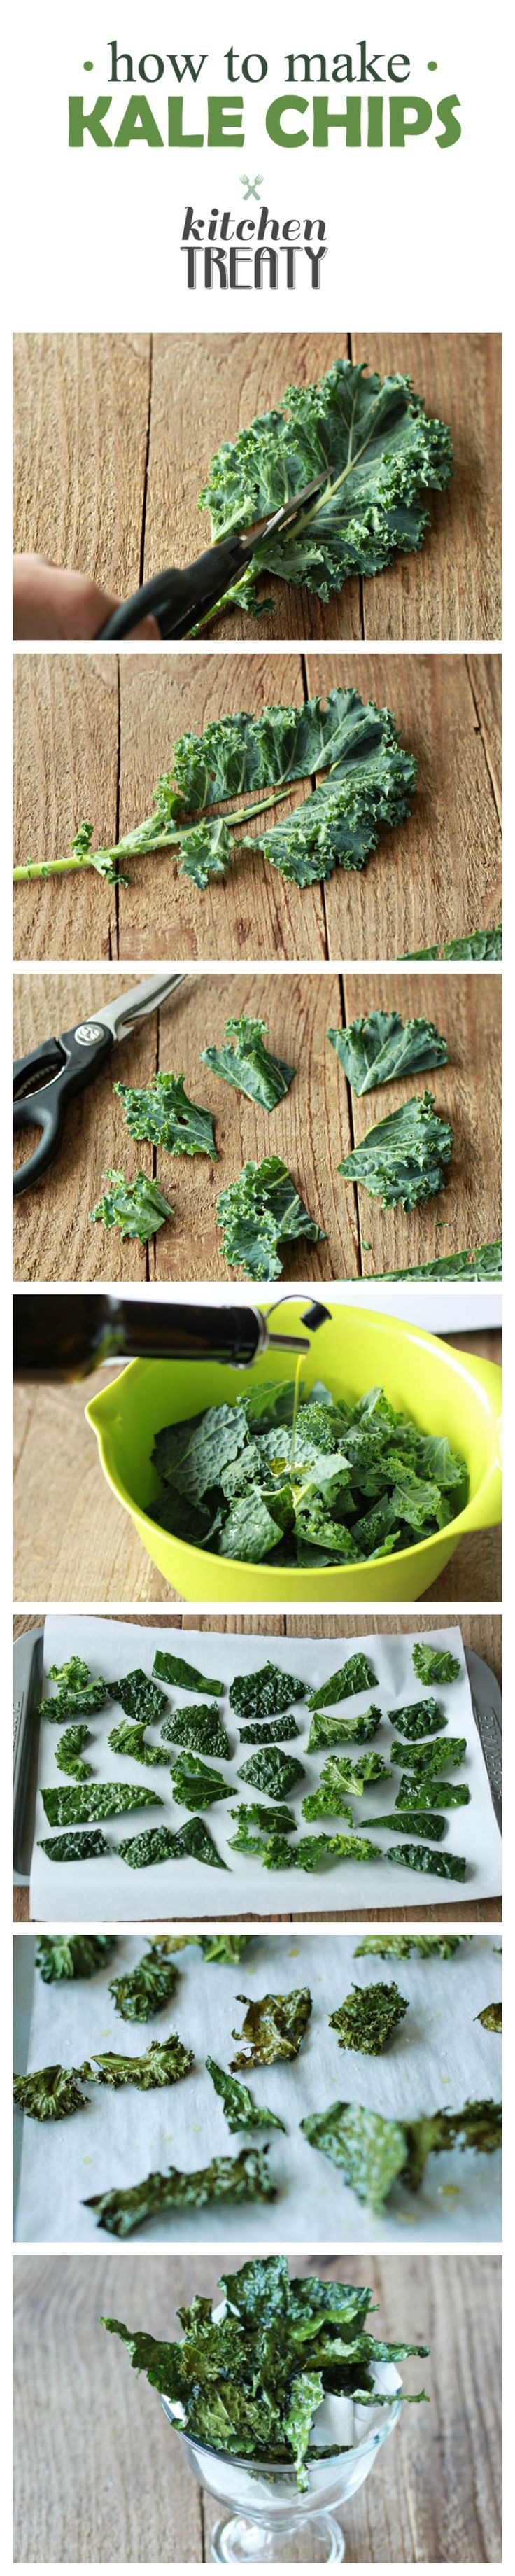 Kale Chips, Delicious, Healthy Recipe!